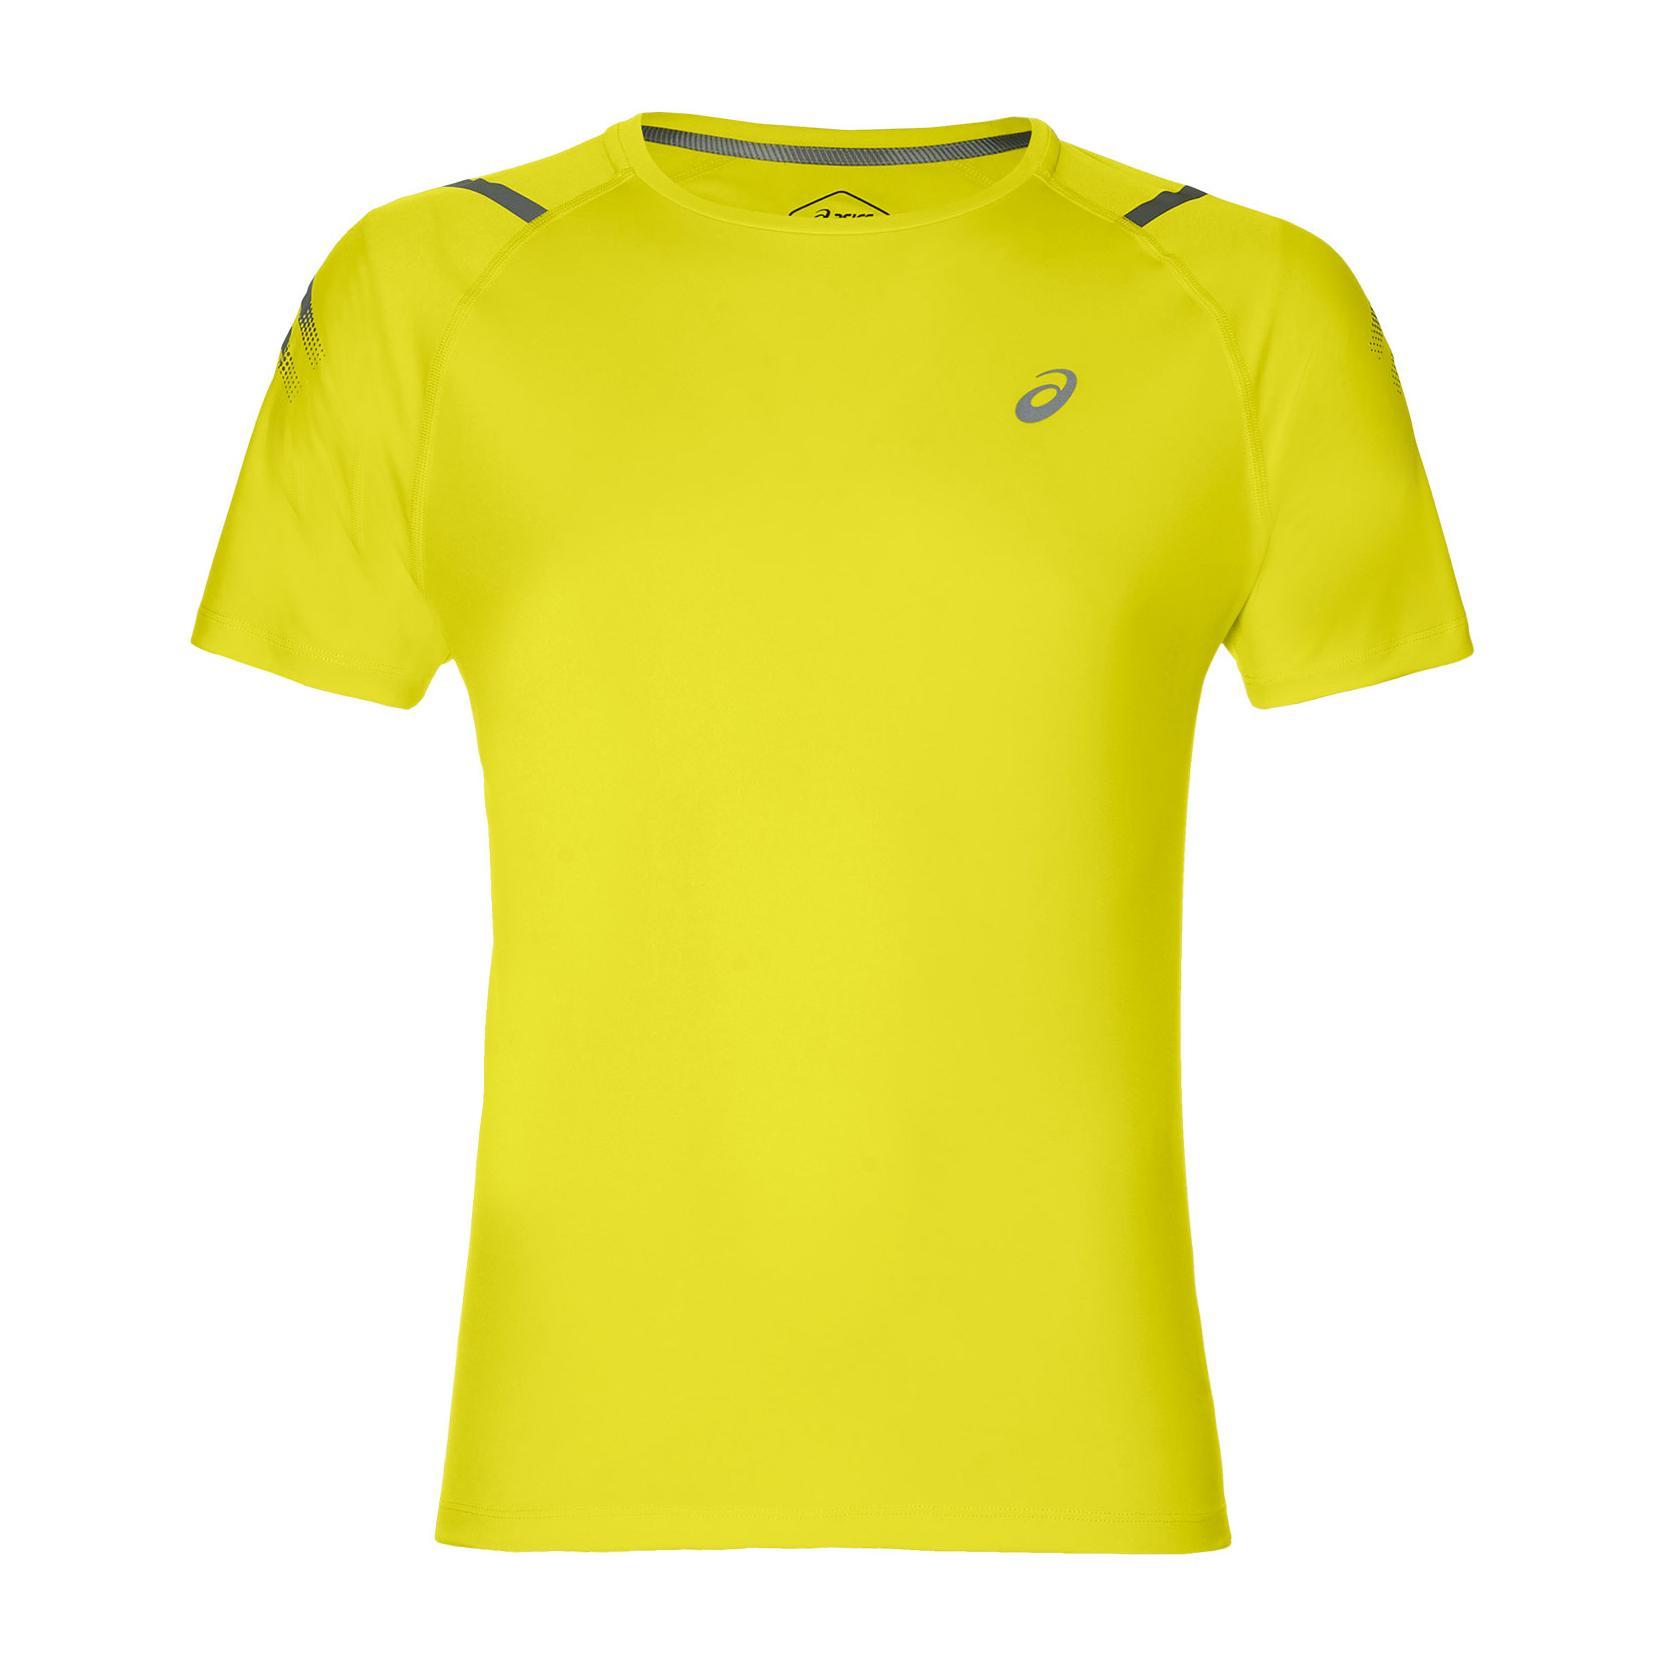 Asics T-shirt Icon Ss